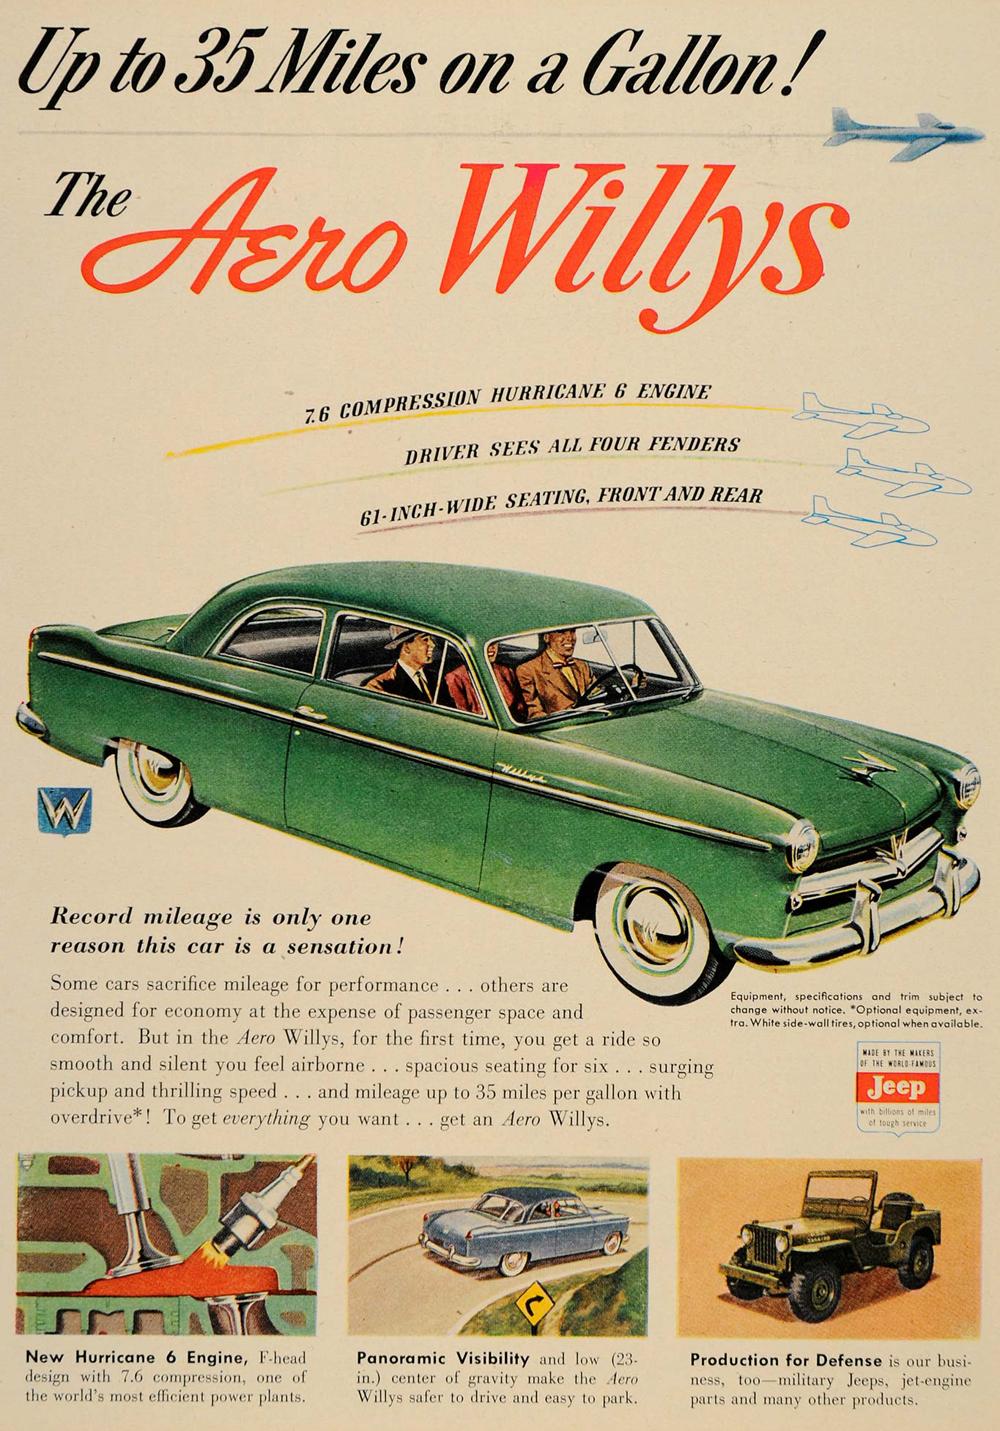 Willys Overland Motor Company History